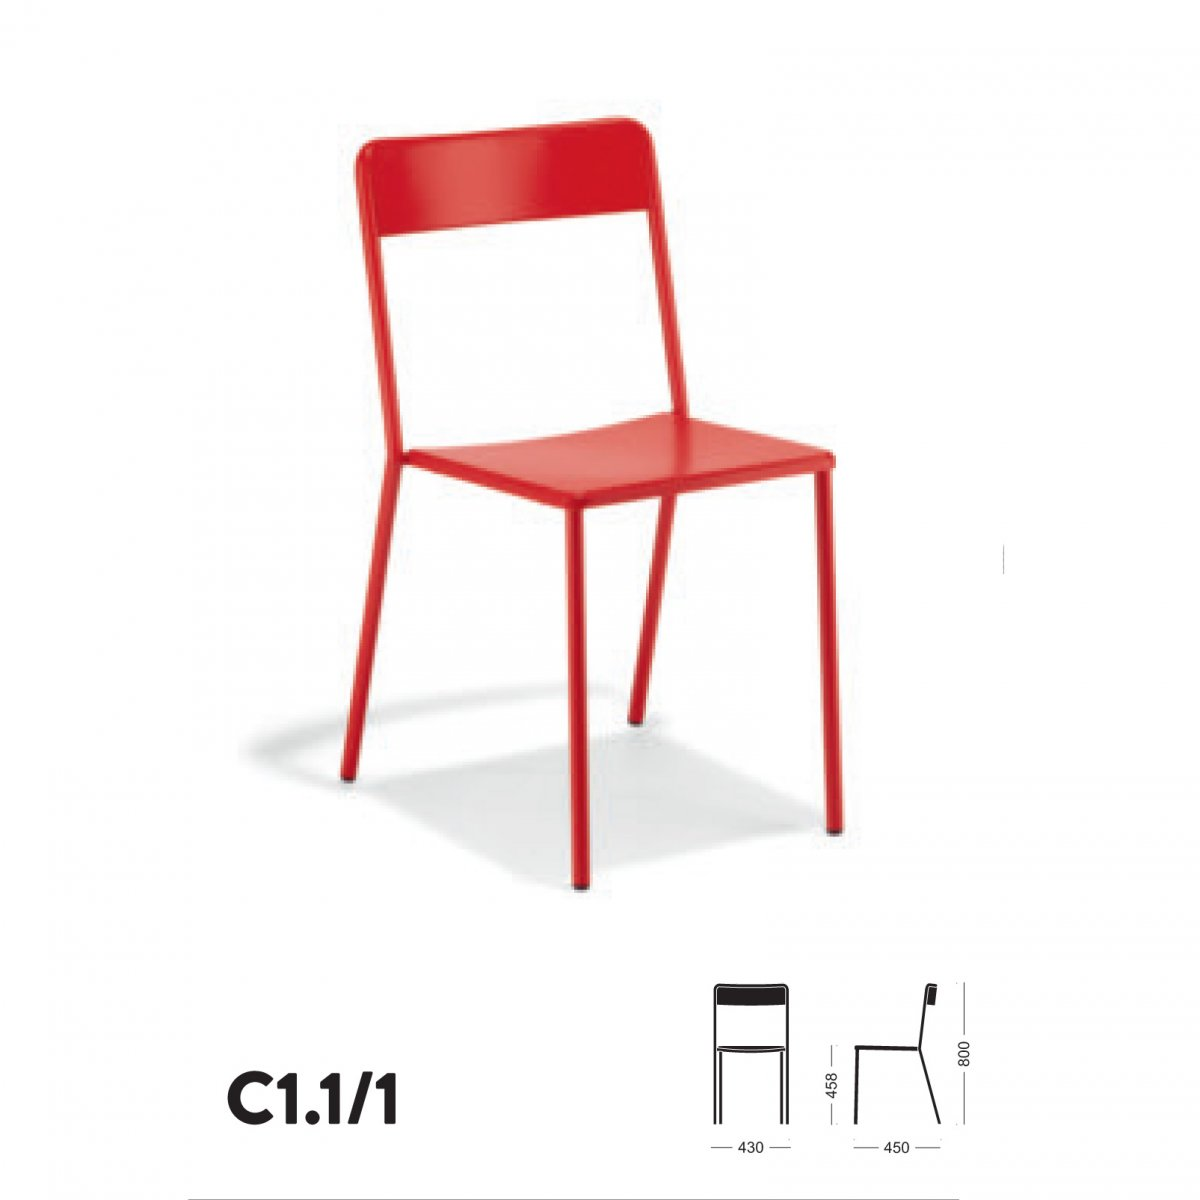 Tavoli In Plastica Impilabili.Colos Sedia C1 1 1 Impilabile In Metallo Colos Tavoli E Sedie